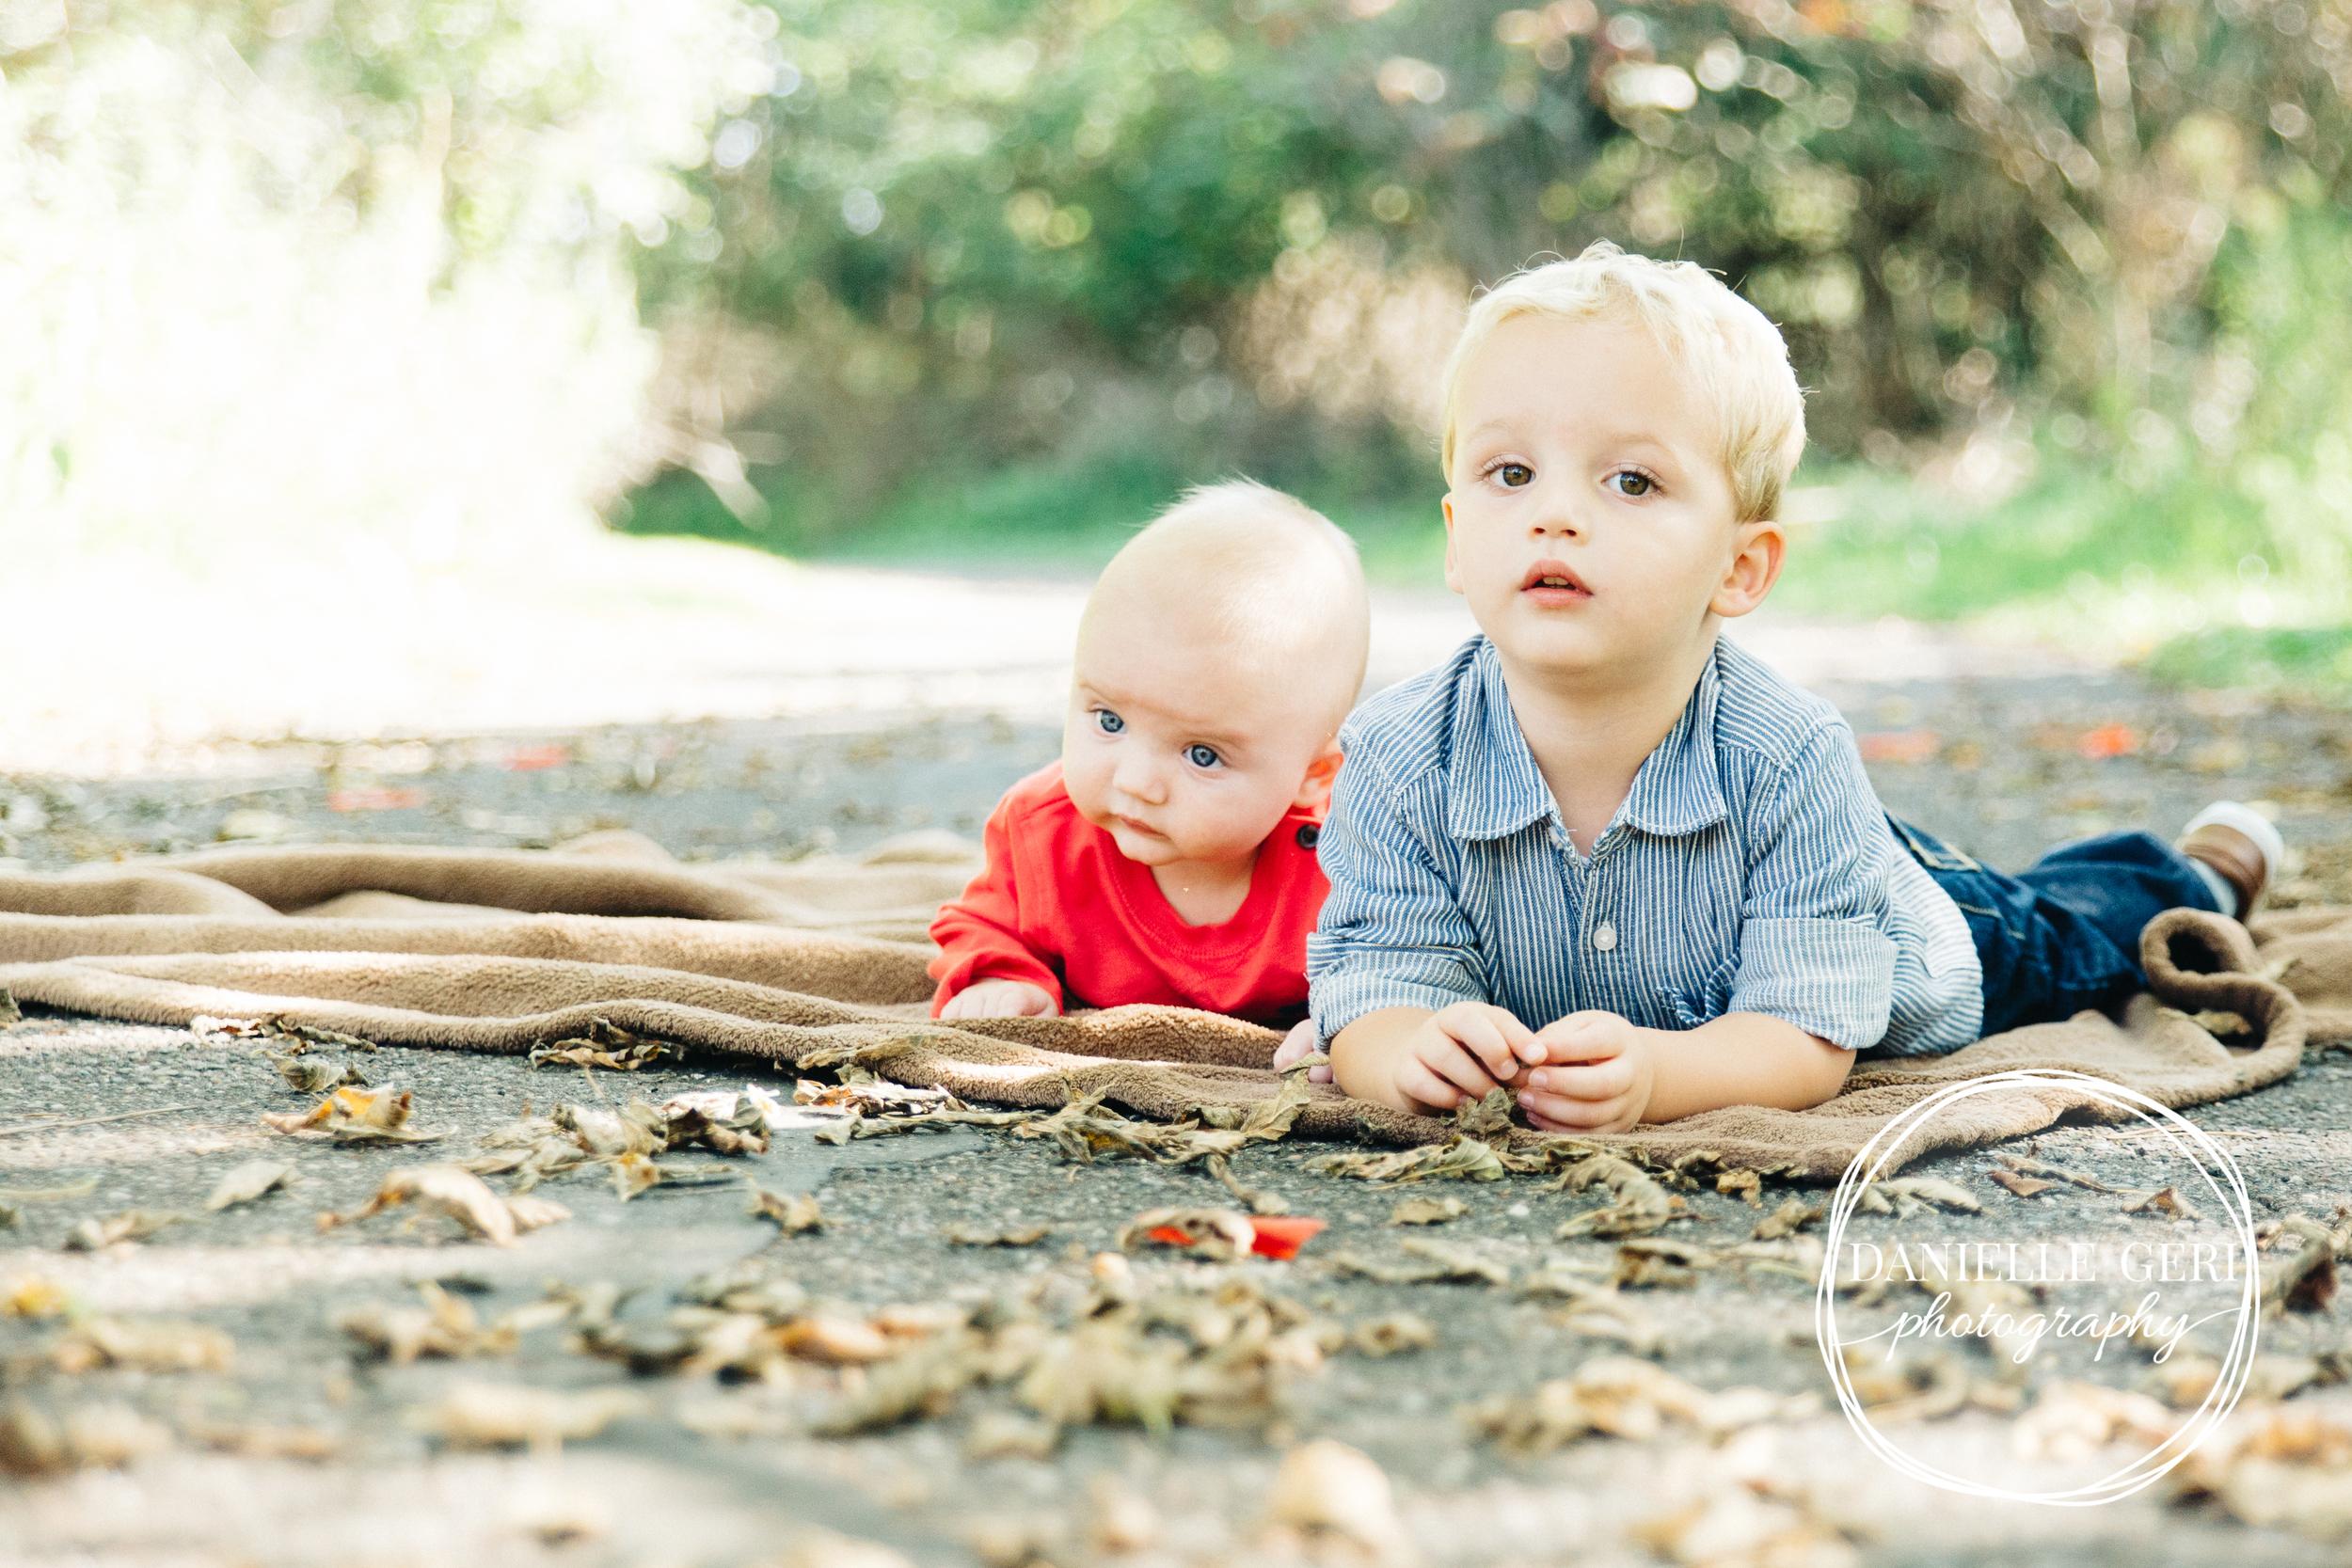 minneapolis minnesota family photography-11.jpg